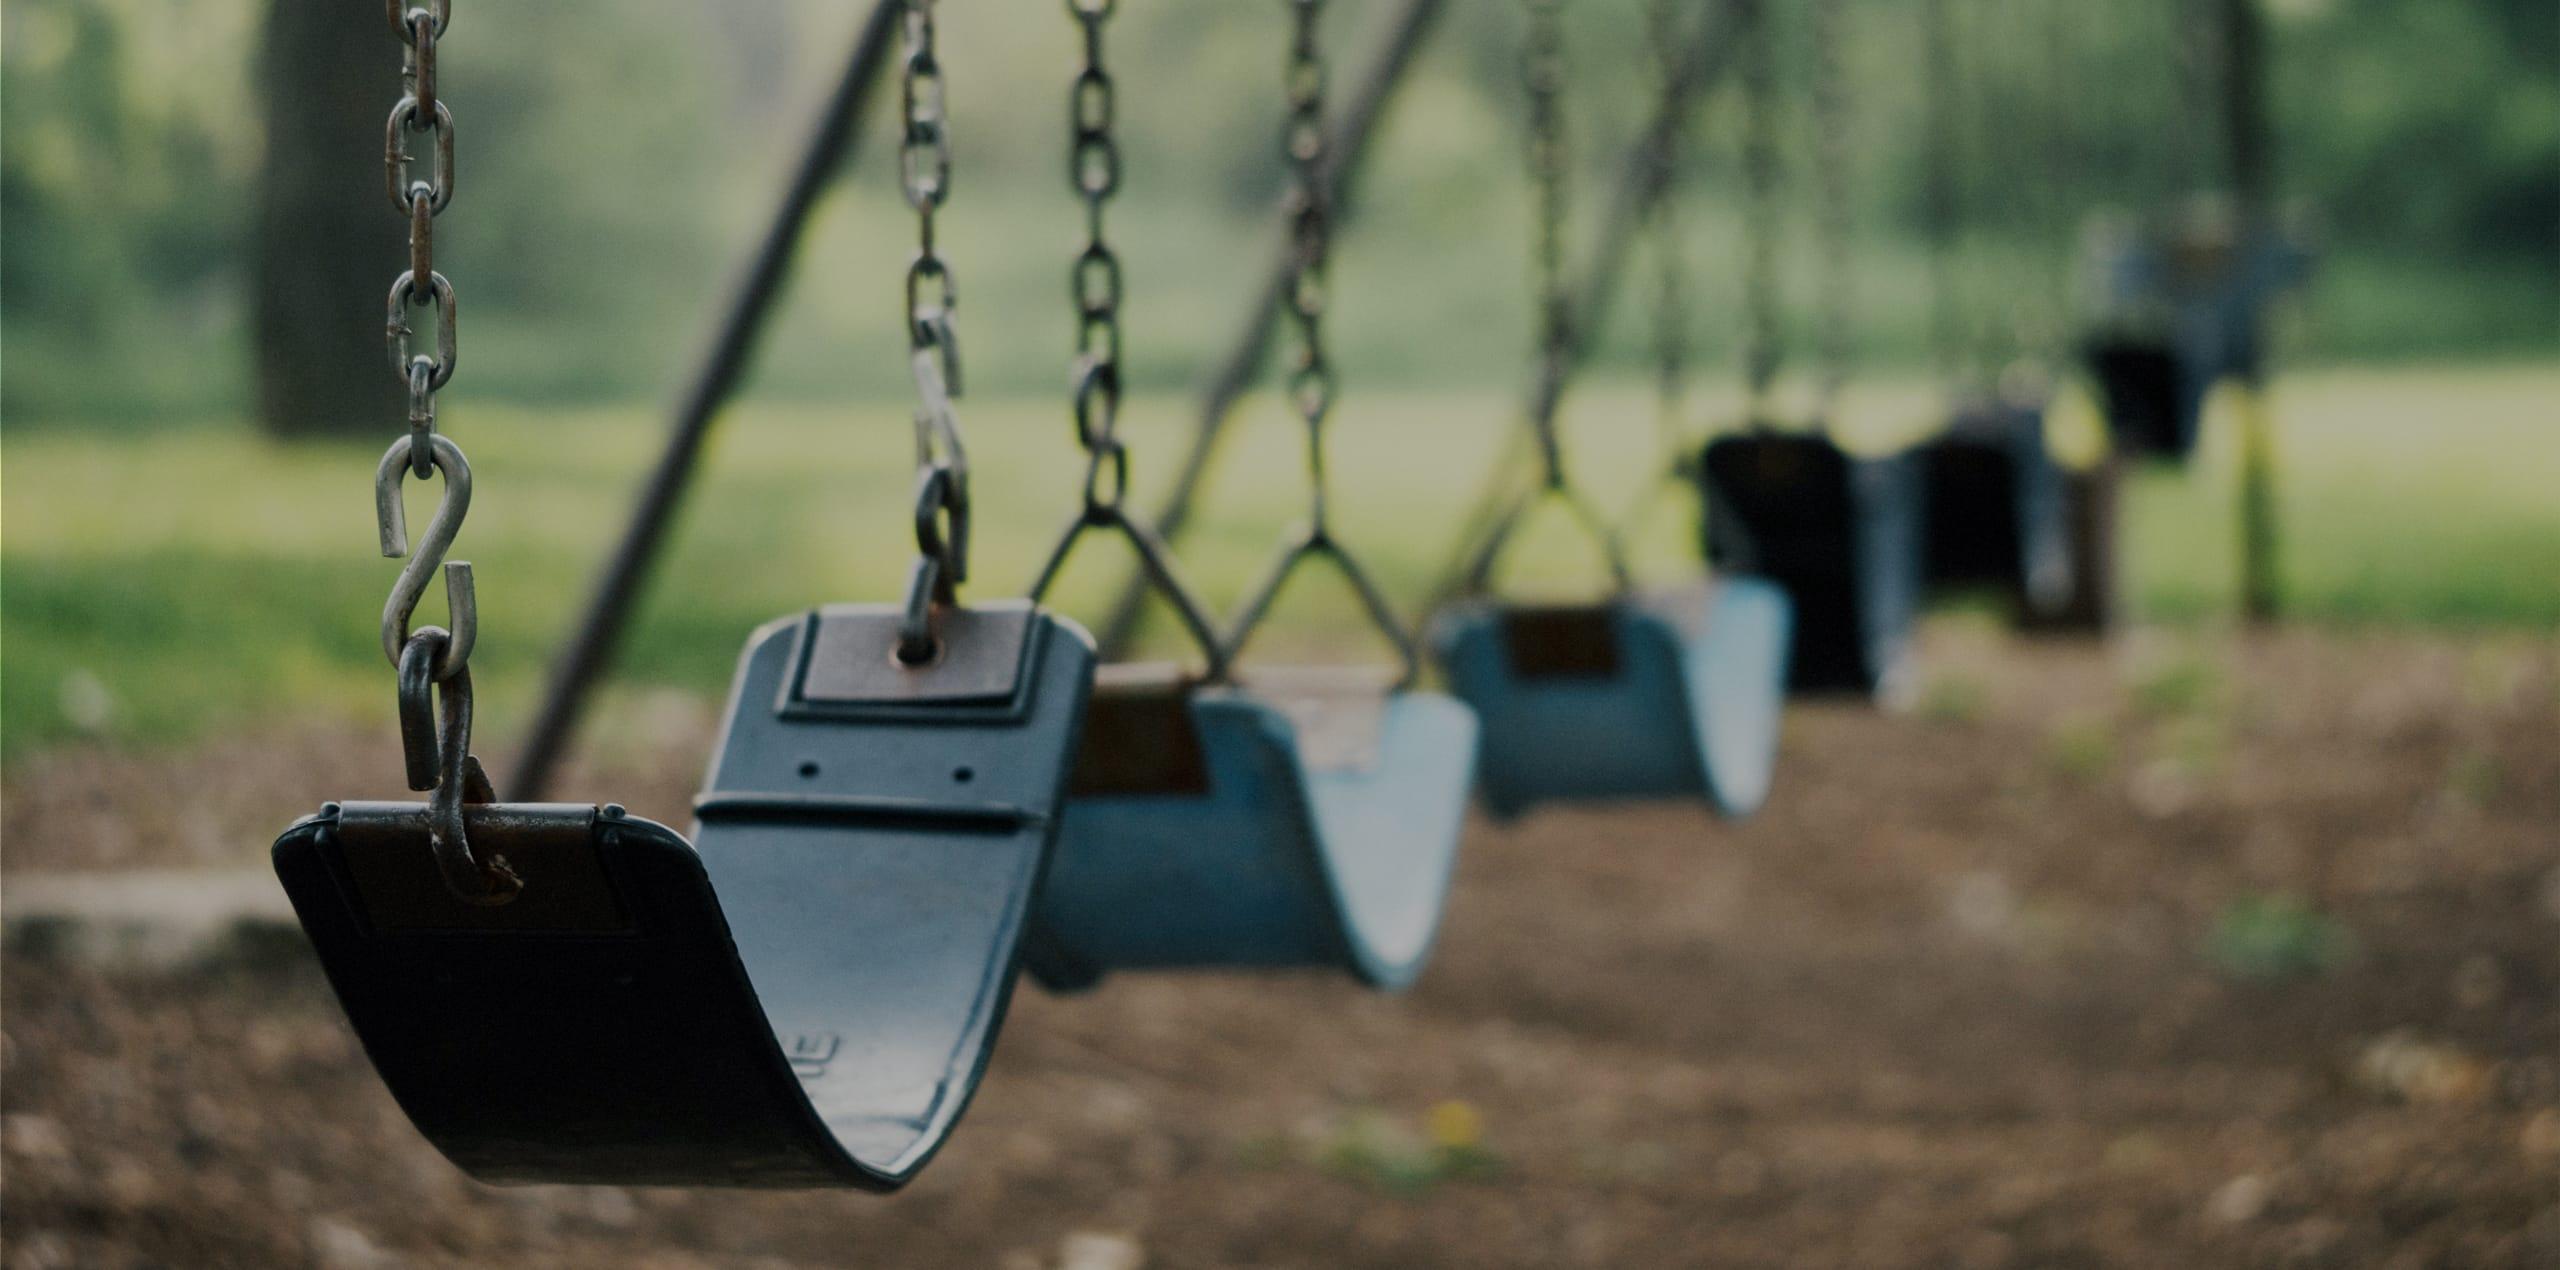 colomer-nou-parc-fundicion-mobiliario-urbano-parques-infantiles-restauracion-slider-home-columpios-1